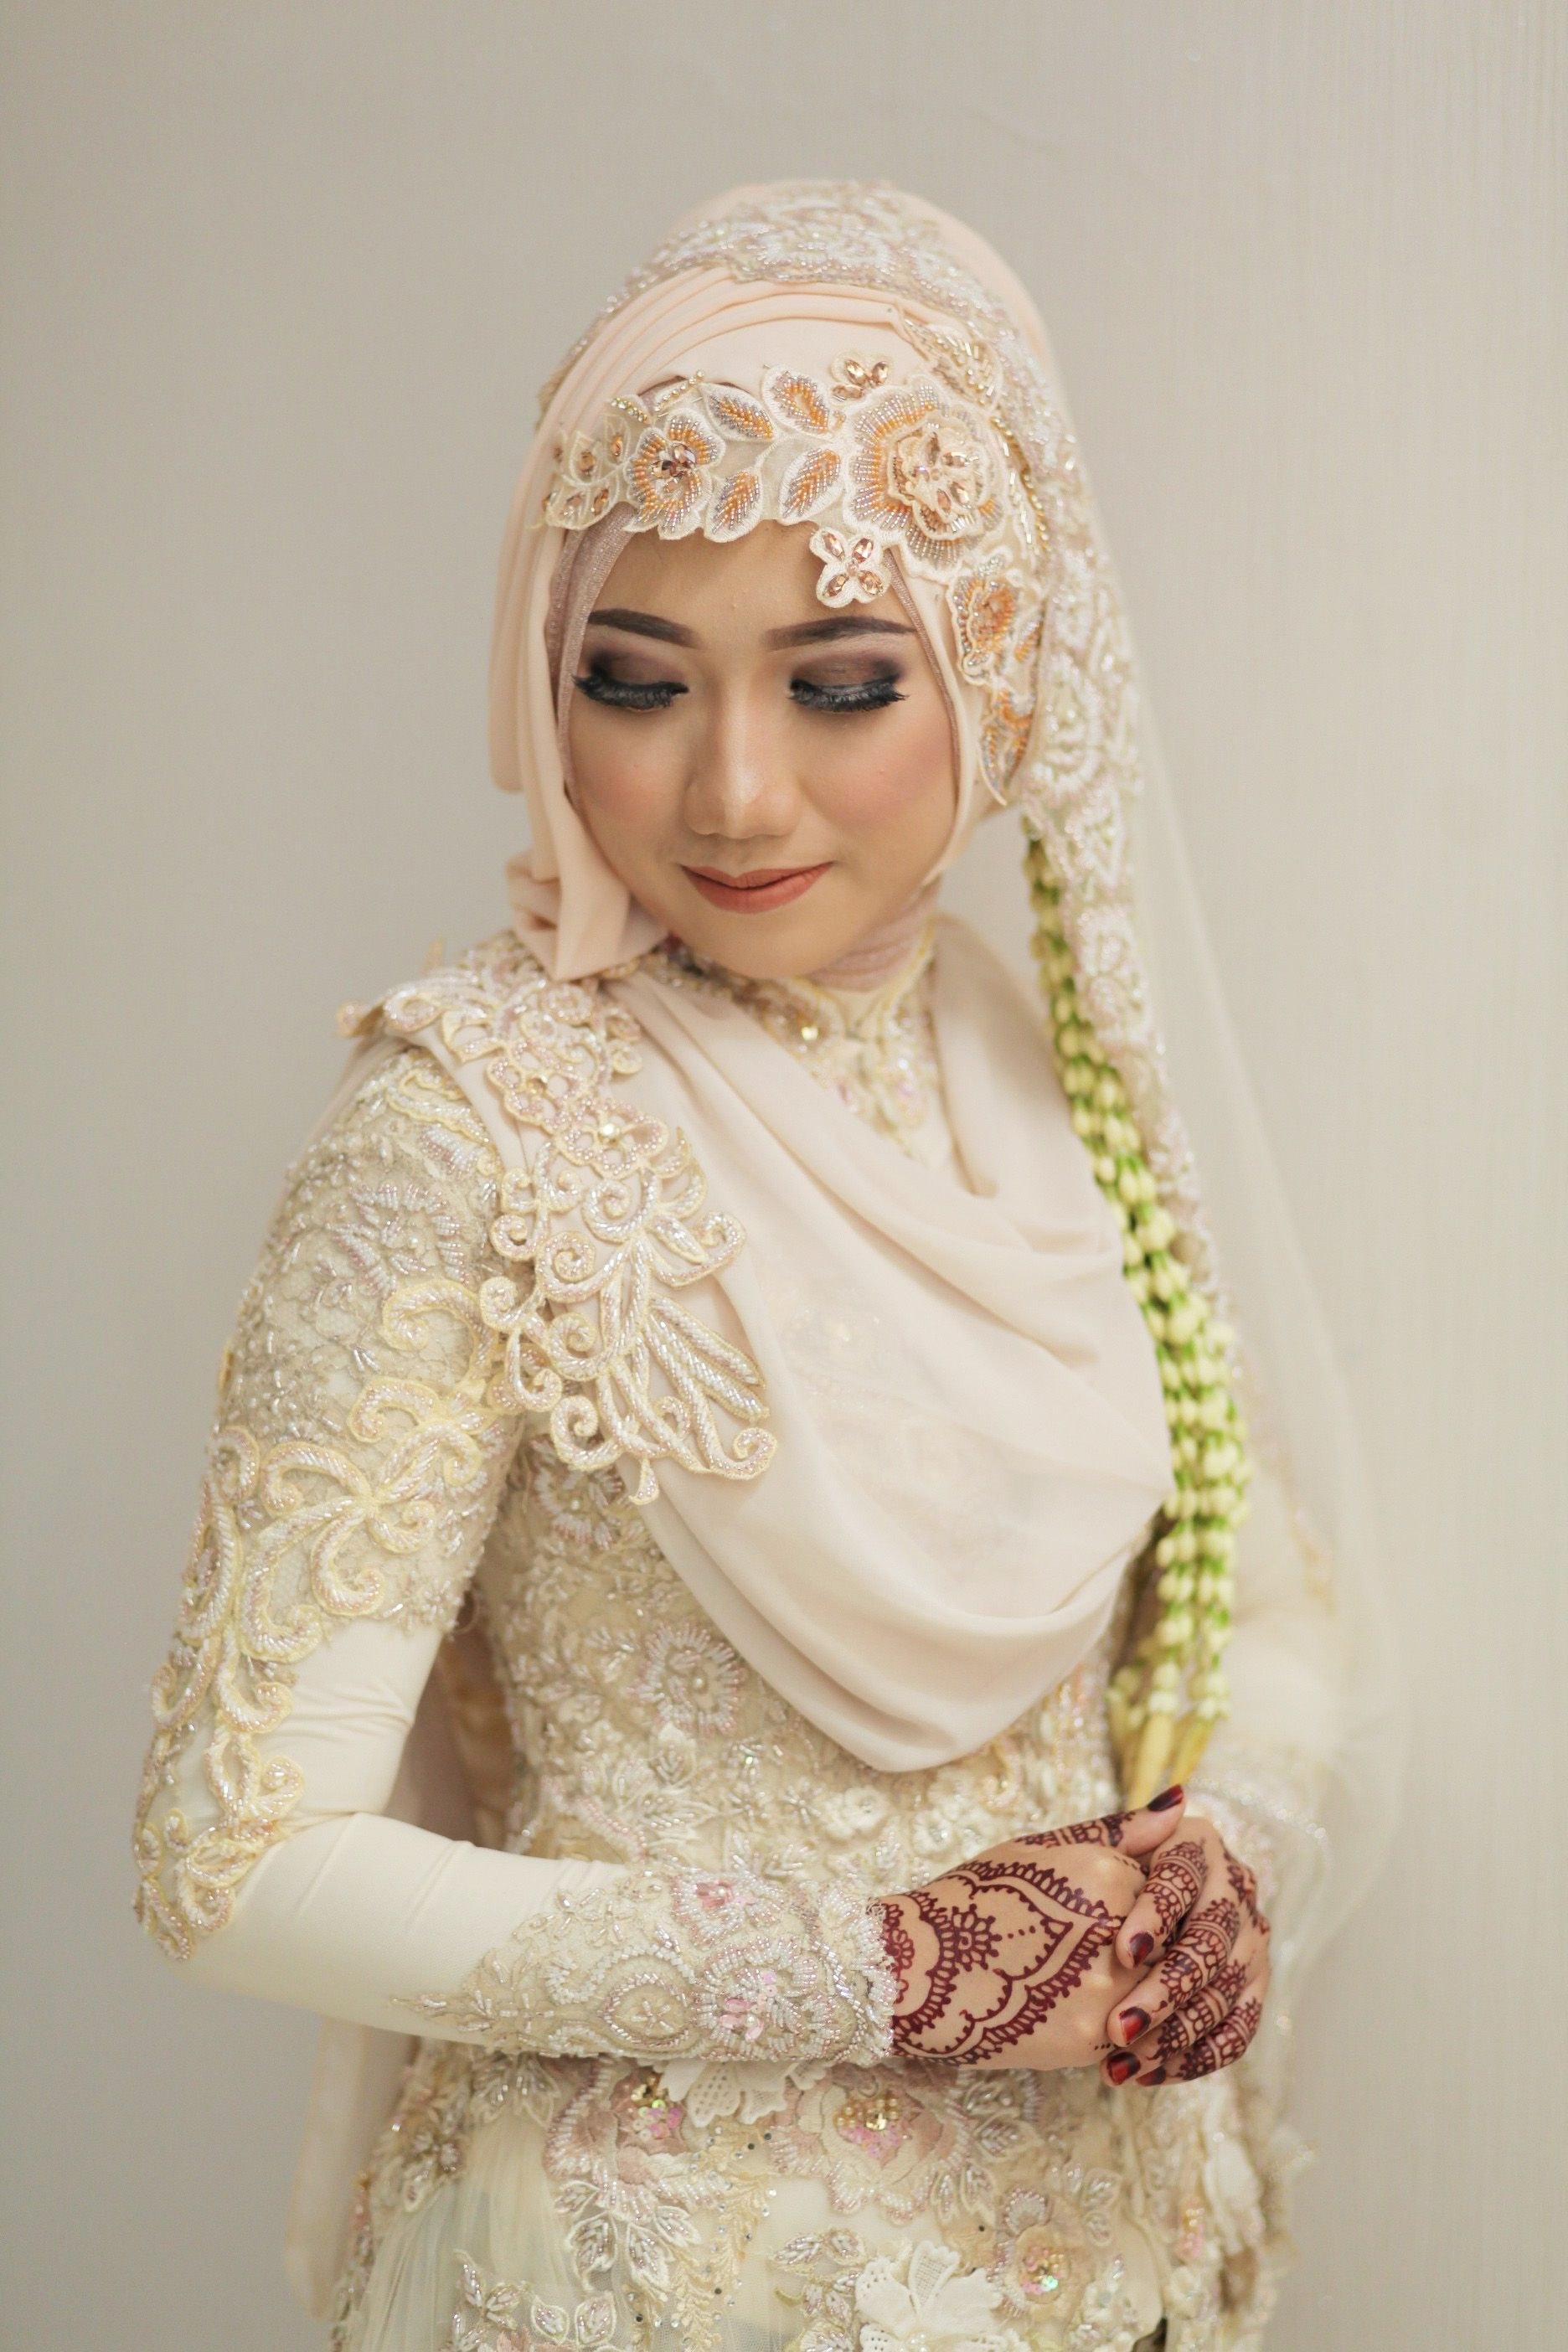 Model Baju Pengiring Pengantin Muslimah Ftd8 Awalia Nofitasari Awalianofitasar On Pinterest